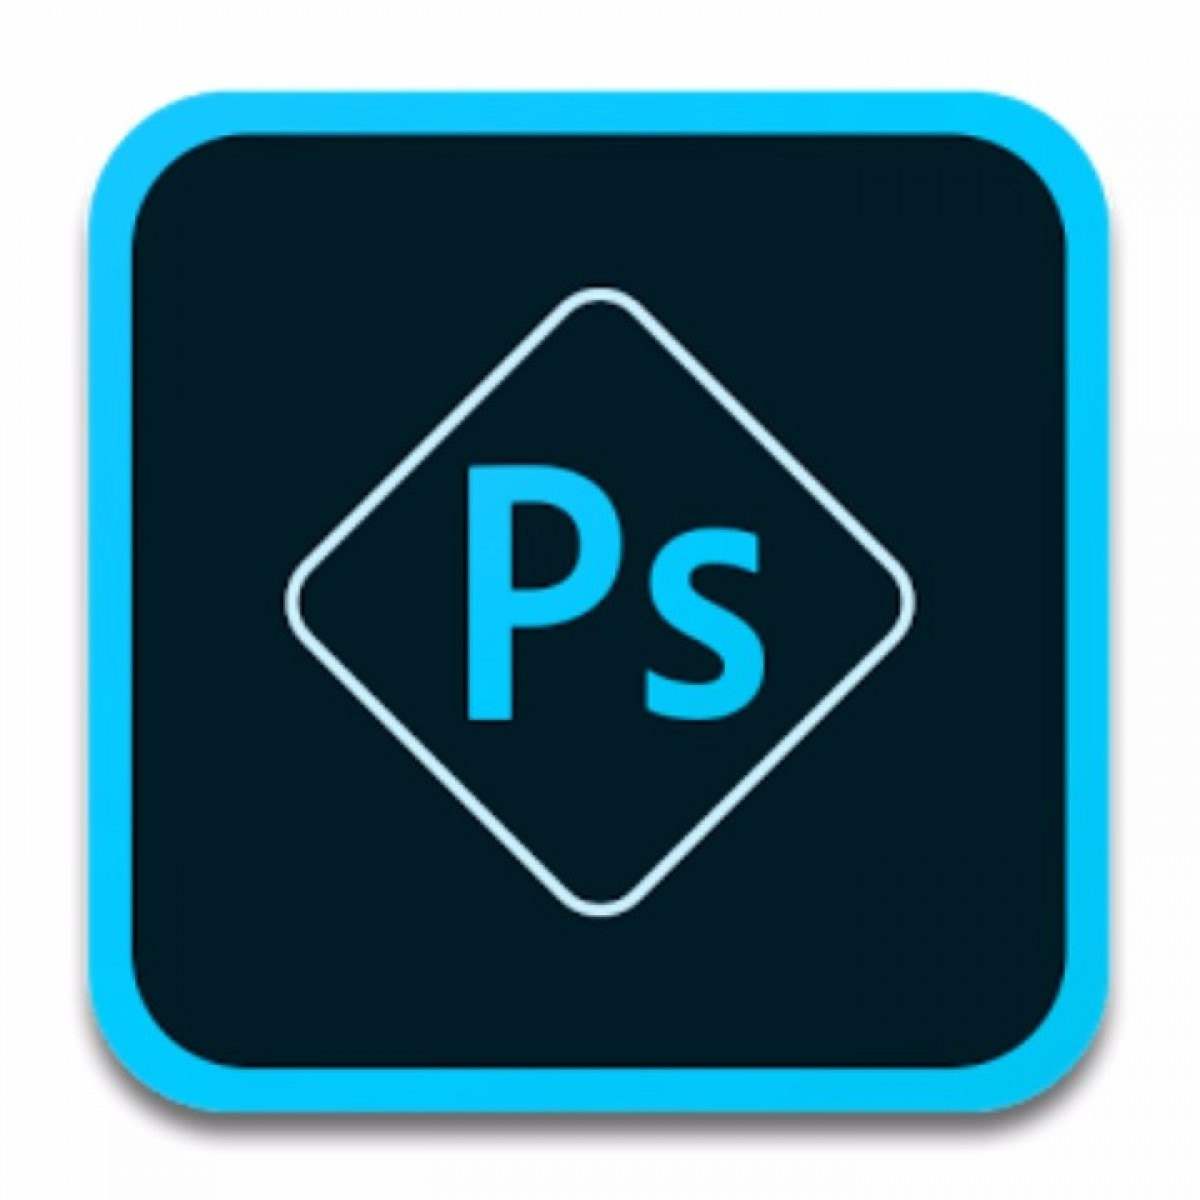 adobe-photoshop-express-photo-editor-collage-maker-premium-v4-0-445-apk_1